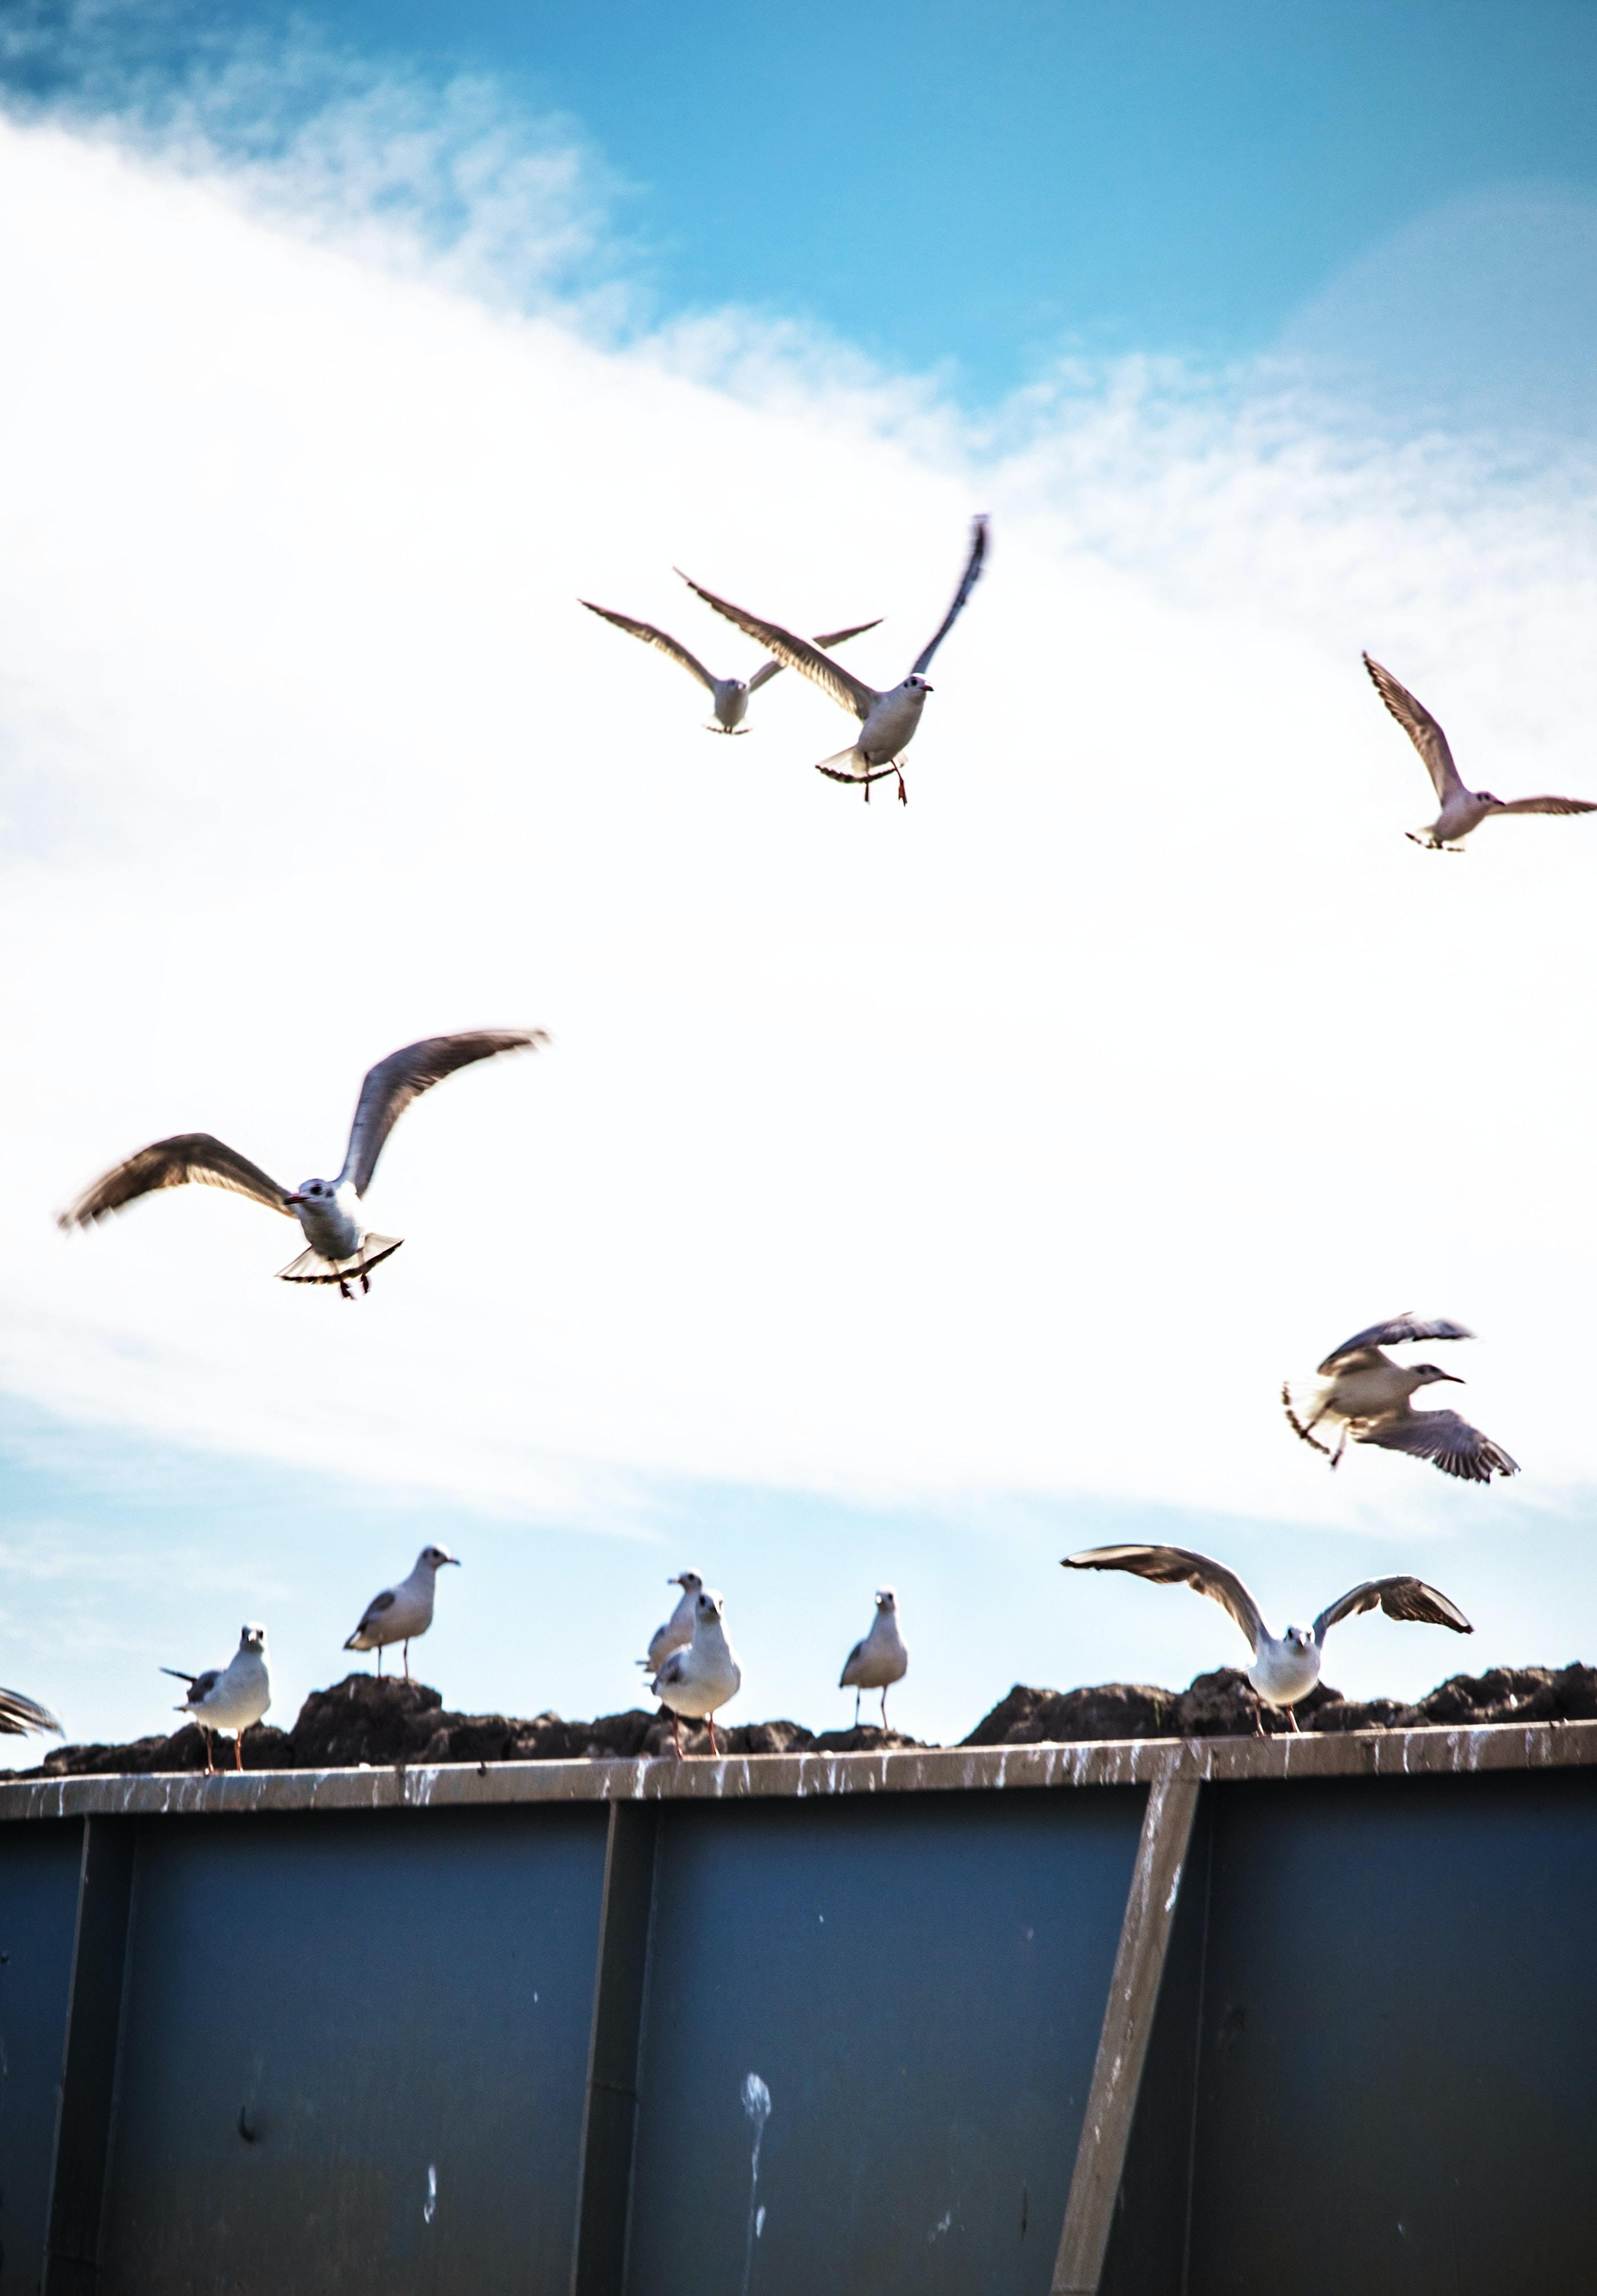 flying flock of birds